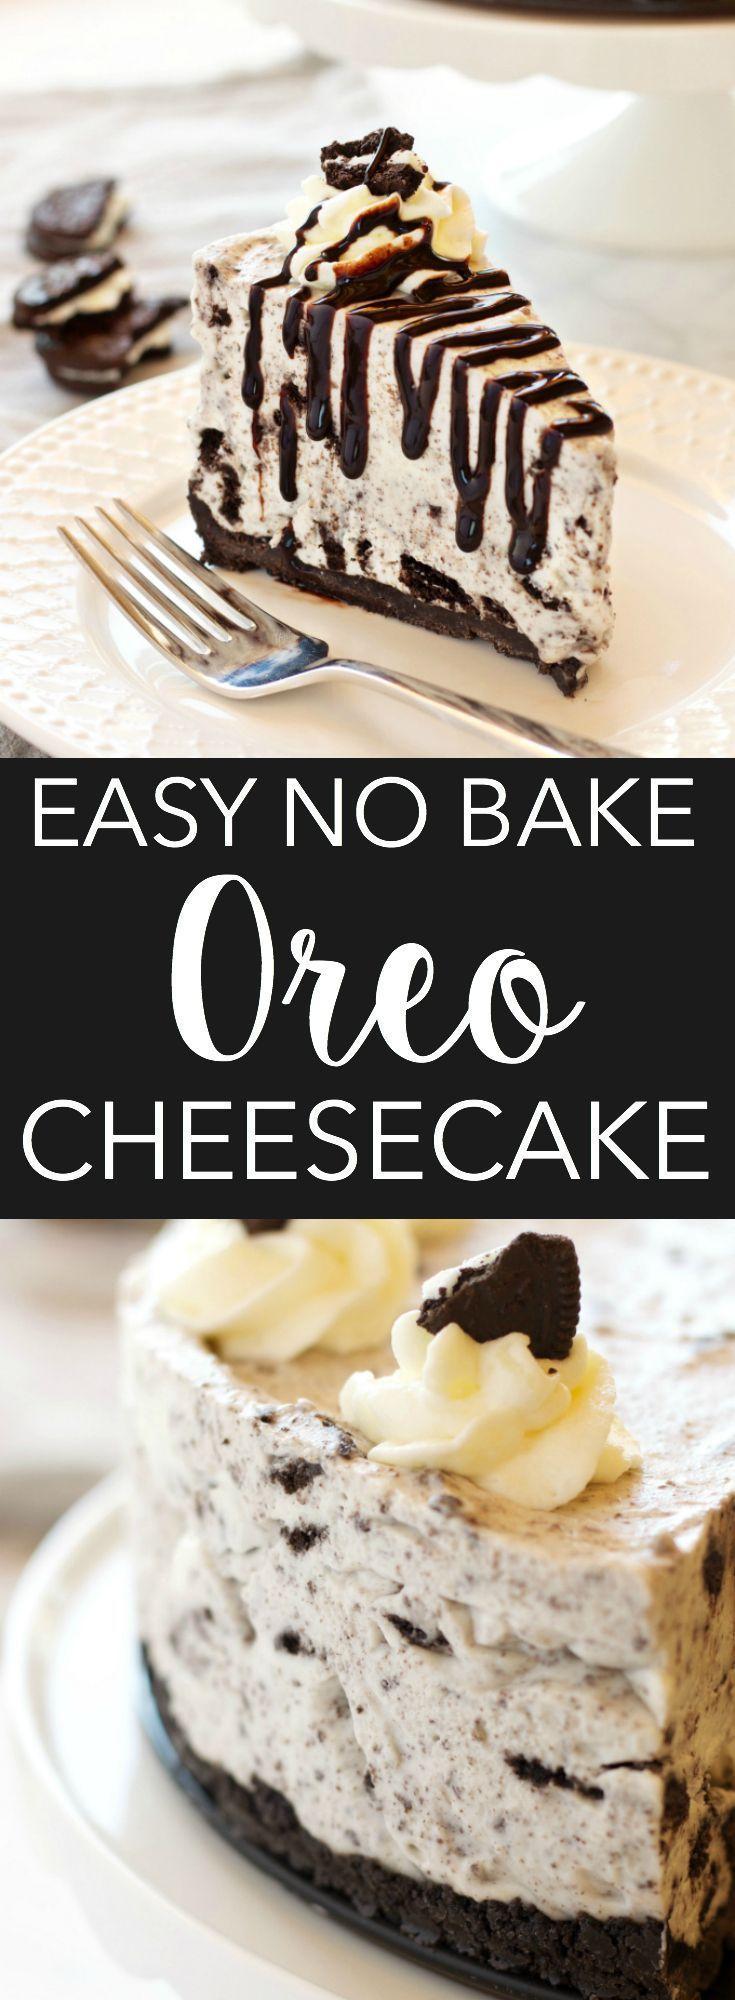 Simply No Bake Oreo cheesecake